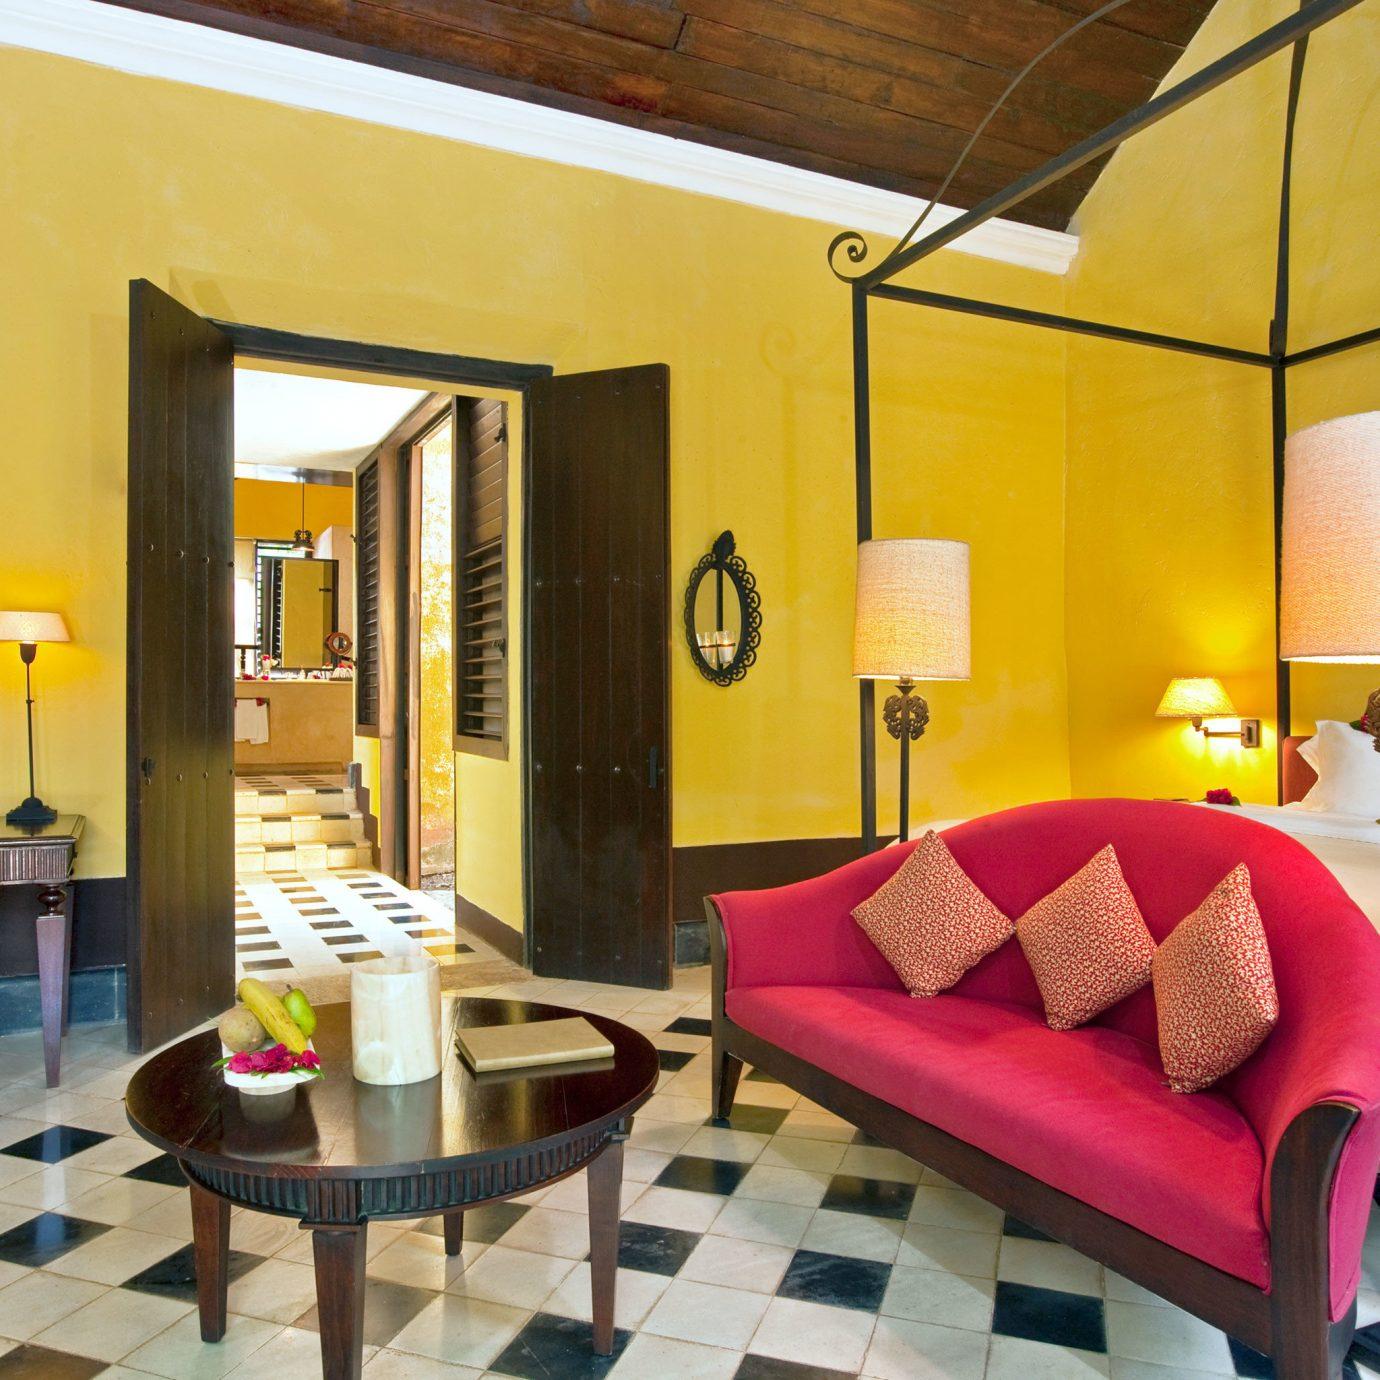 Bedroom Country Hip Luxury Rustic Suite color property living room red condominium home Villa loft Resort